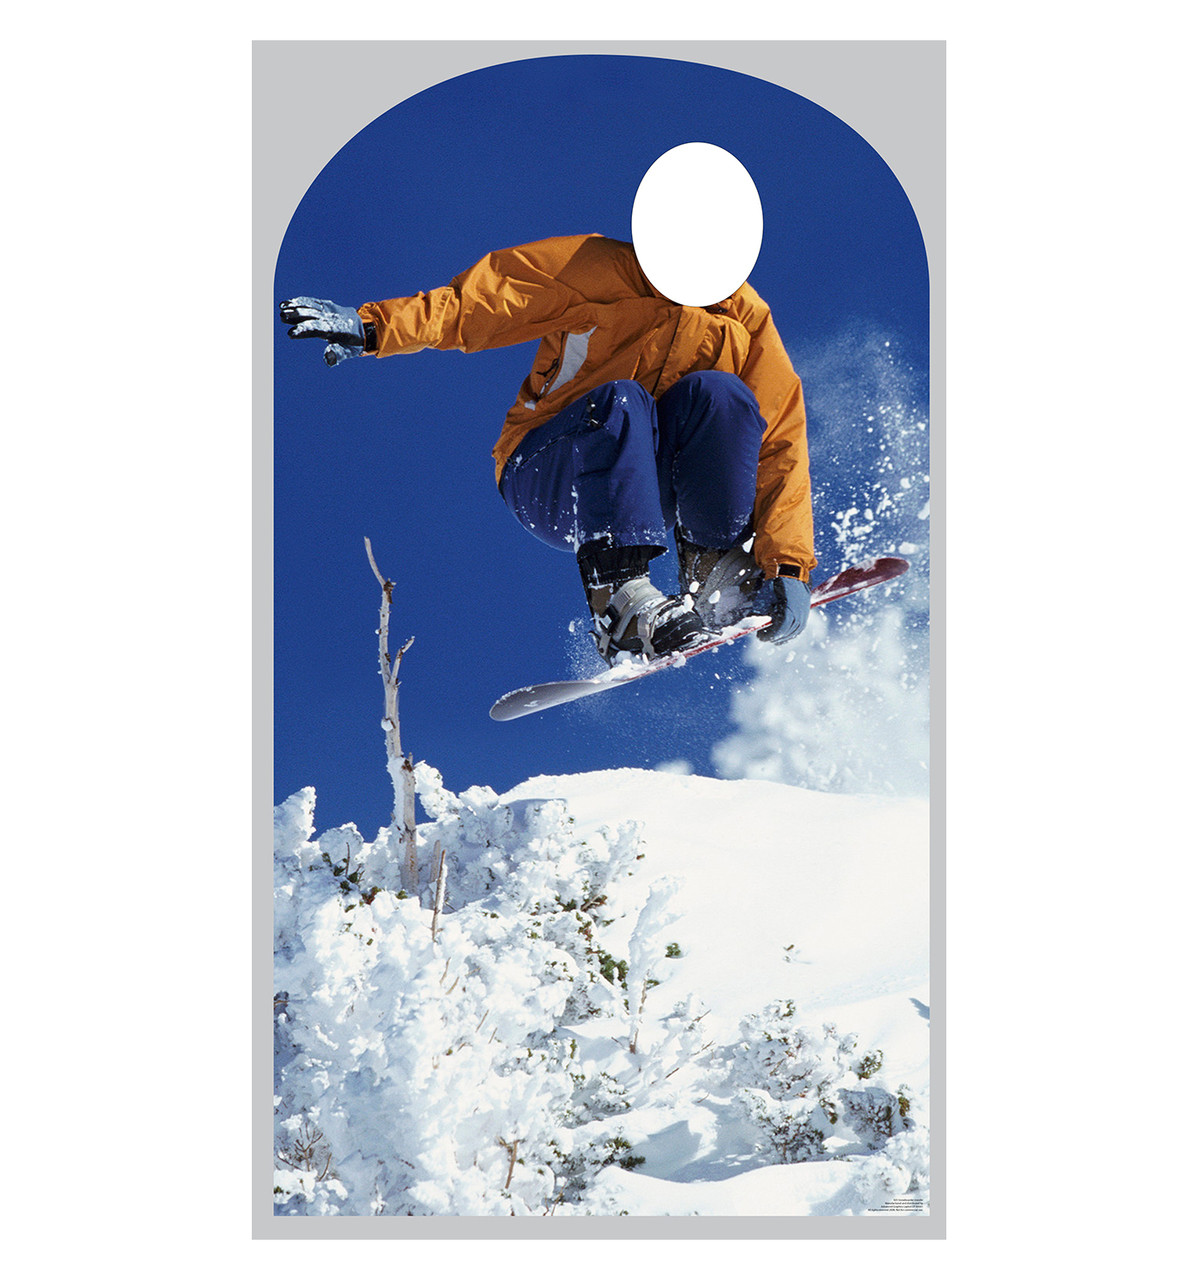 Life-size Snowboarding Standin Cardboard Standup